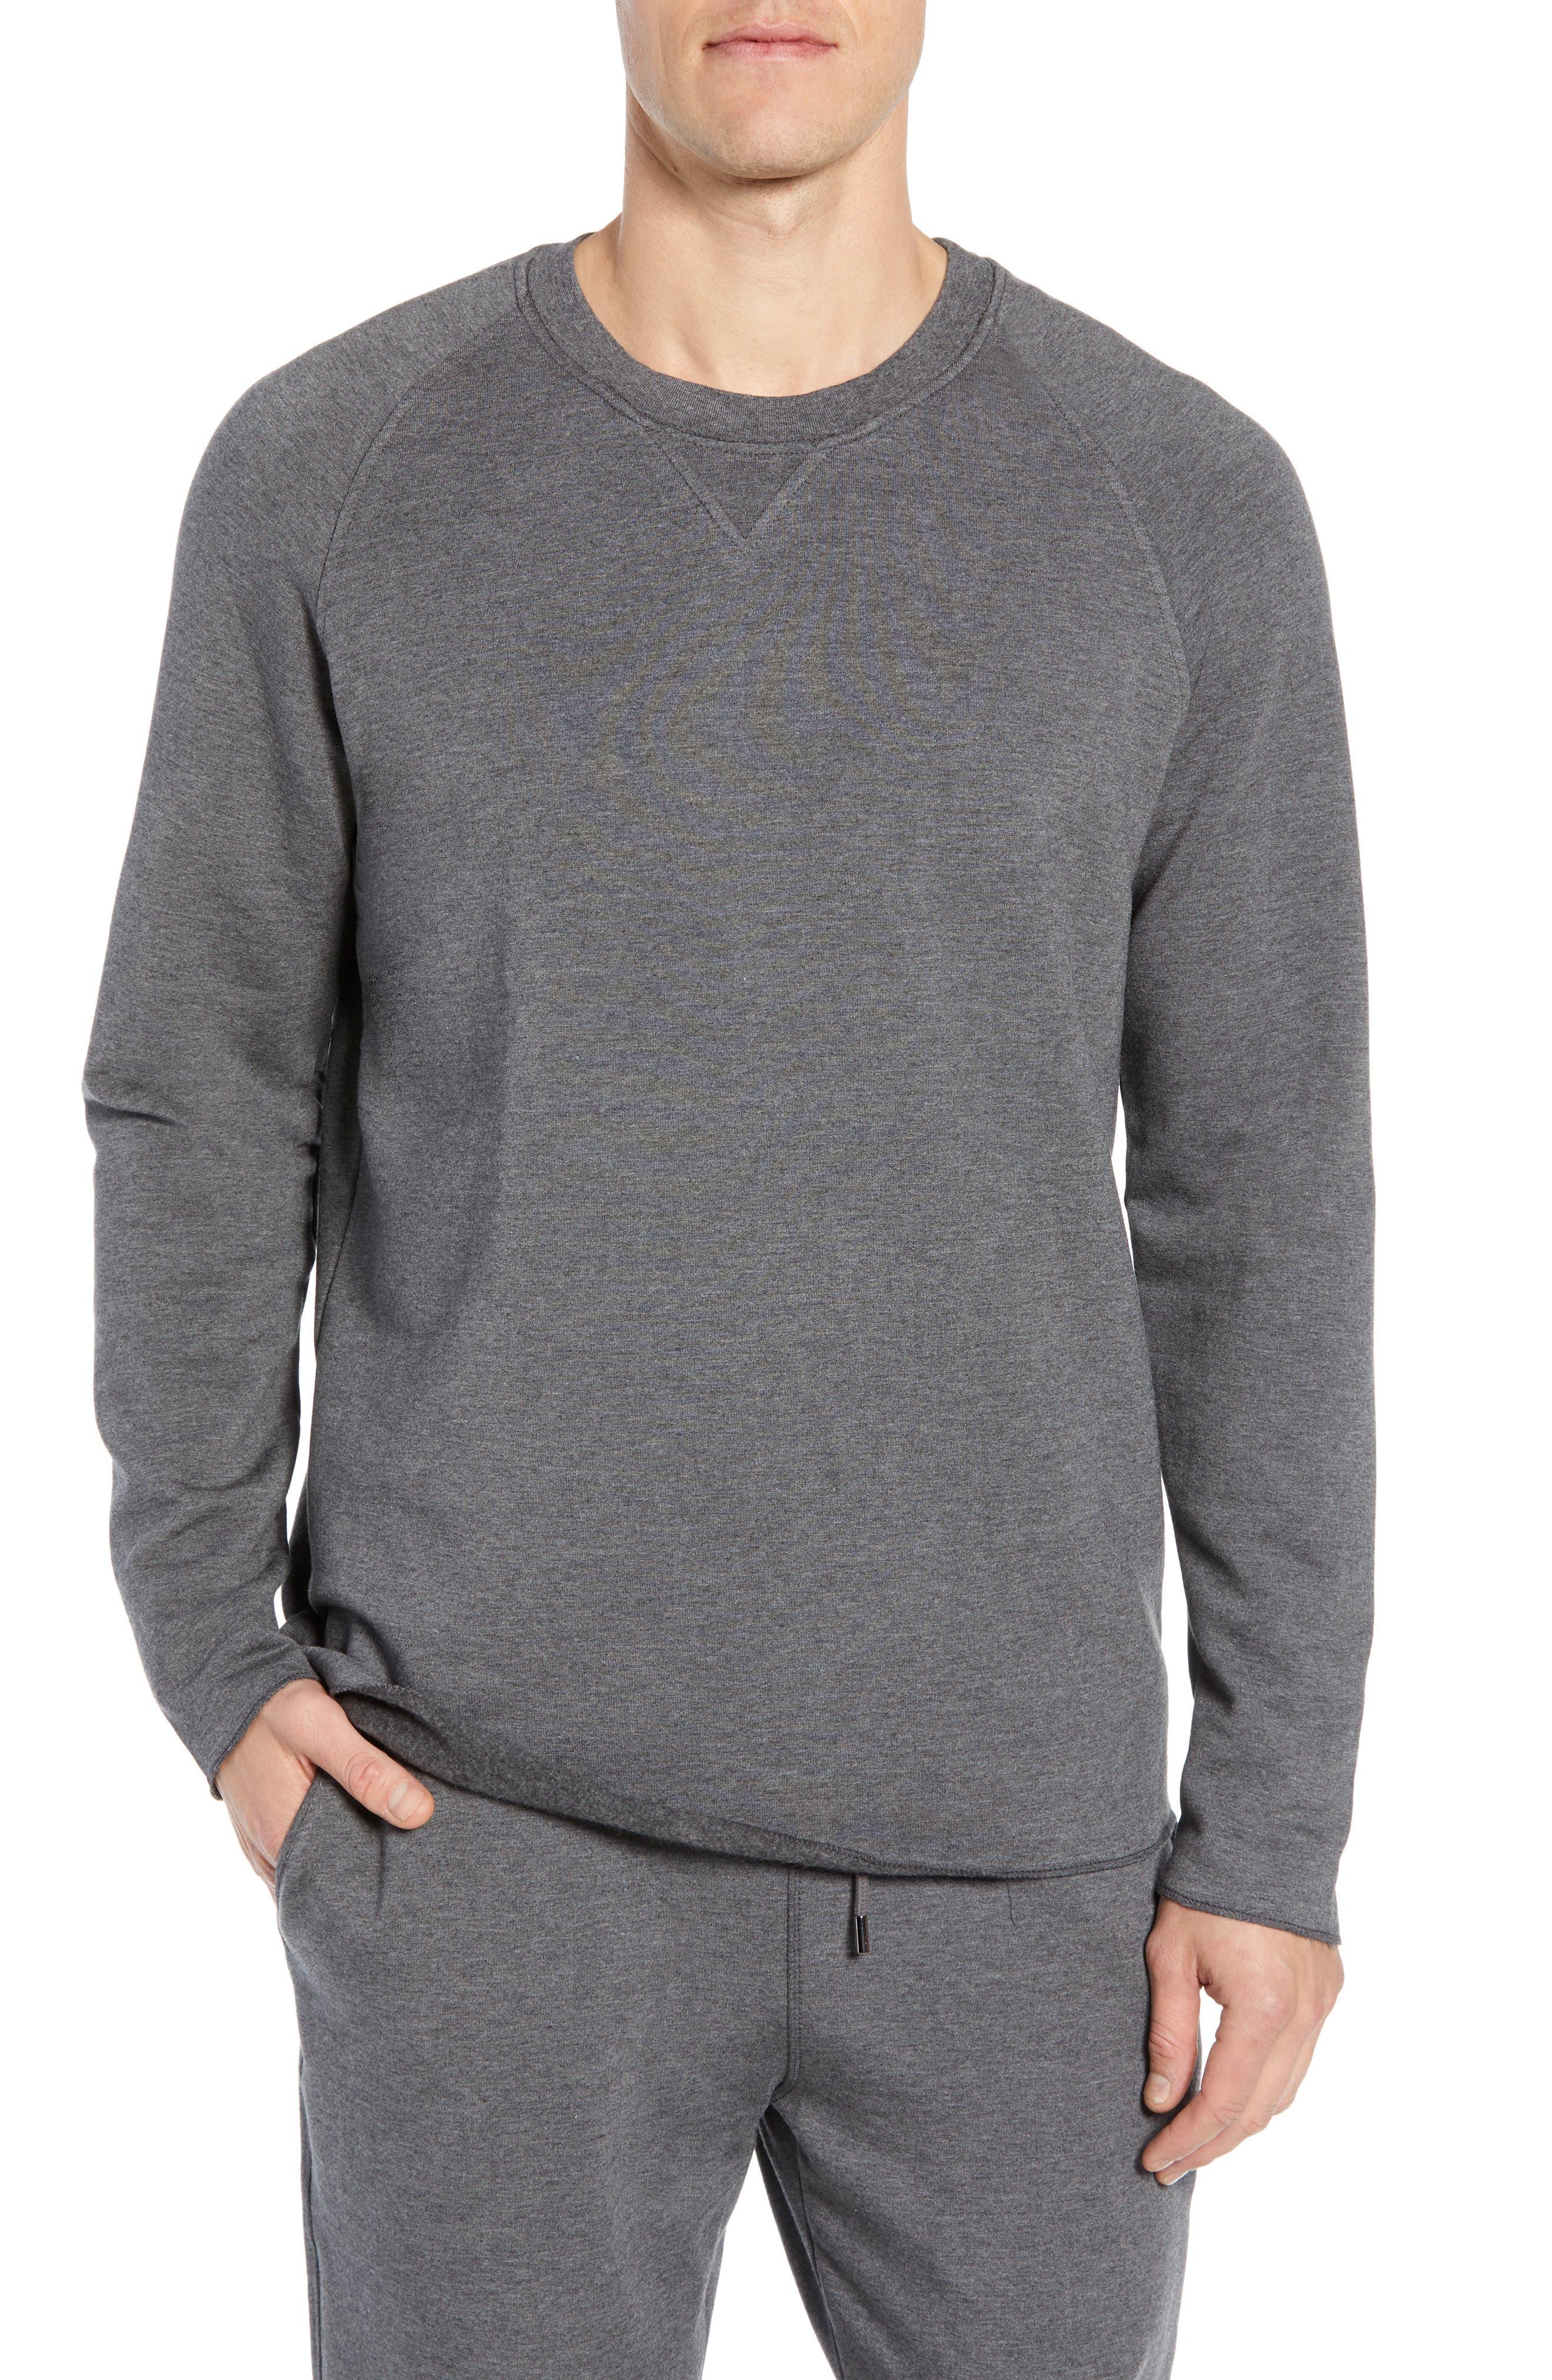 DANIEL BUCHLER Crewneck Modal & Cotton Sweatshirt in Charcoal Heather